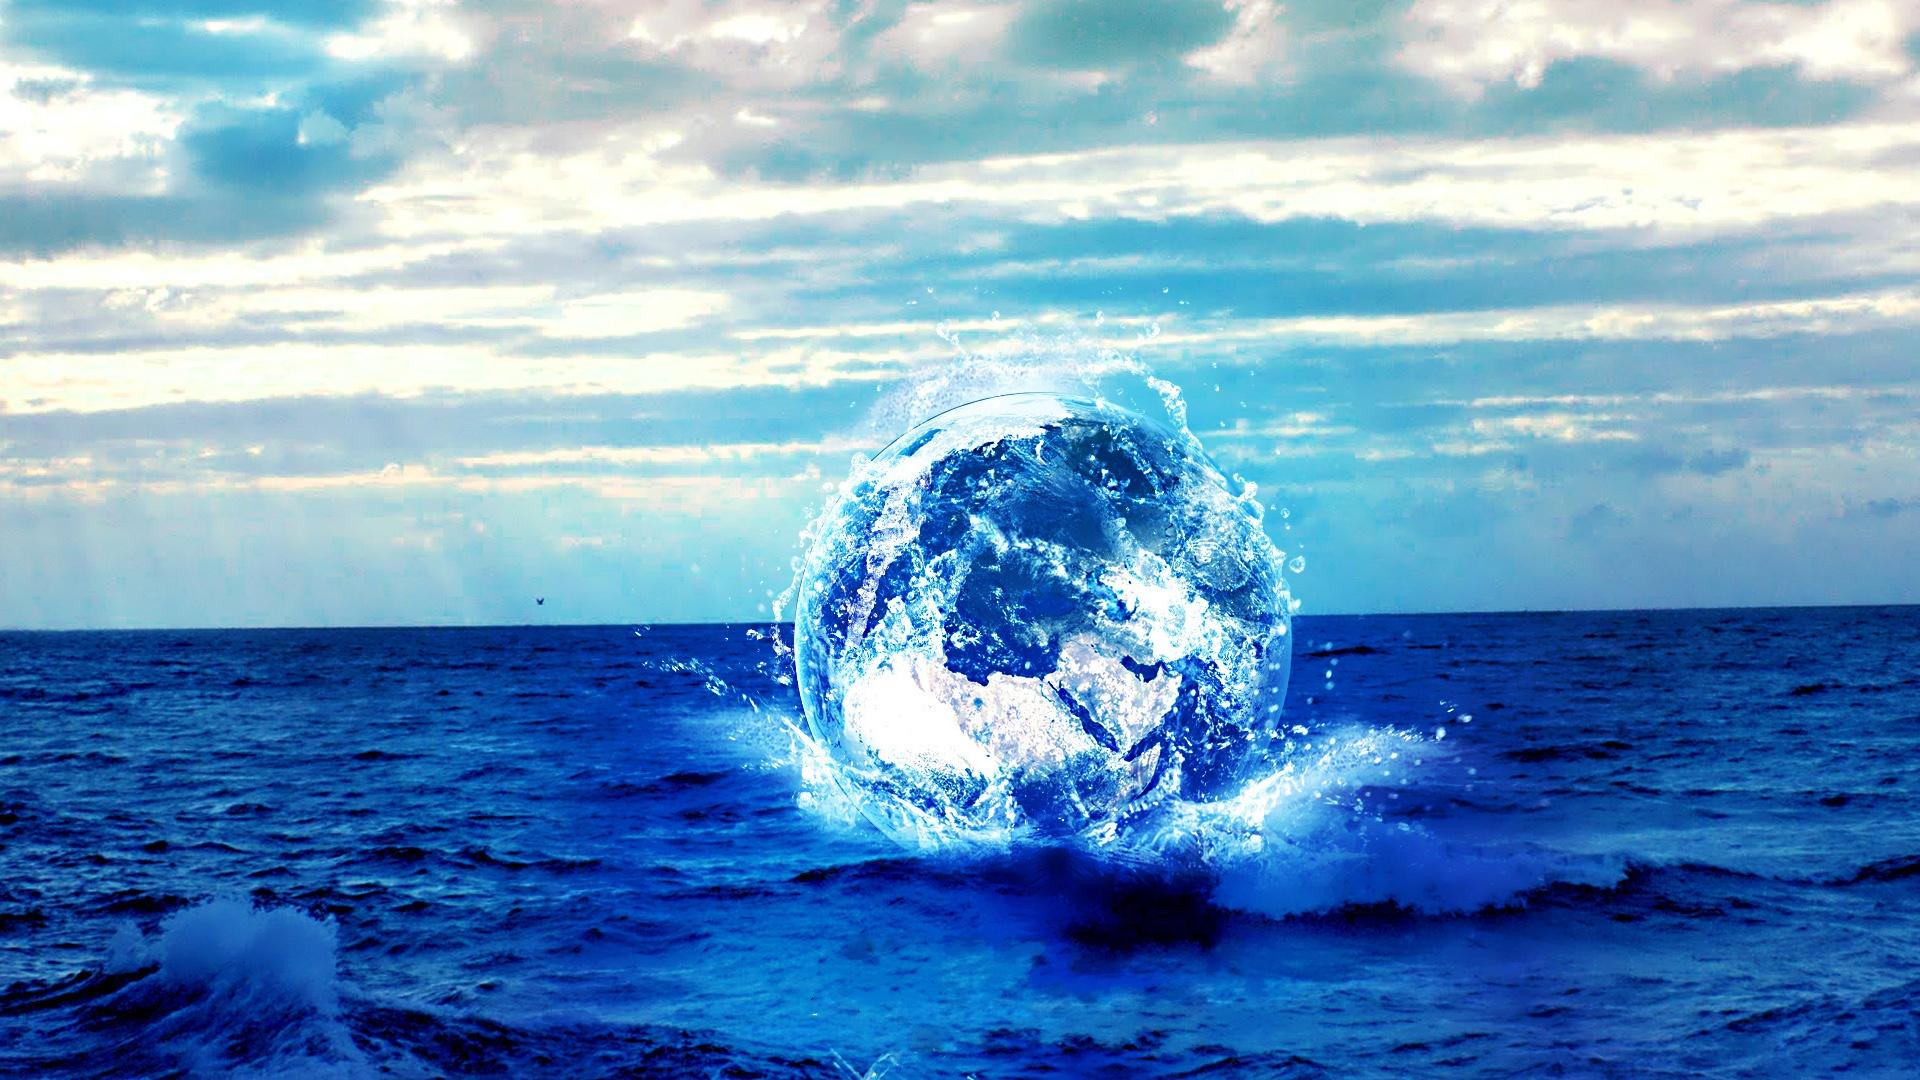 wallpaper sea blue planet creative graphics 1920x1080 full hd